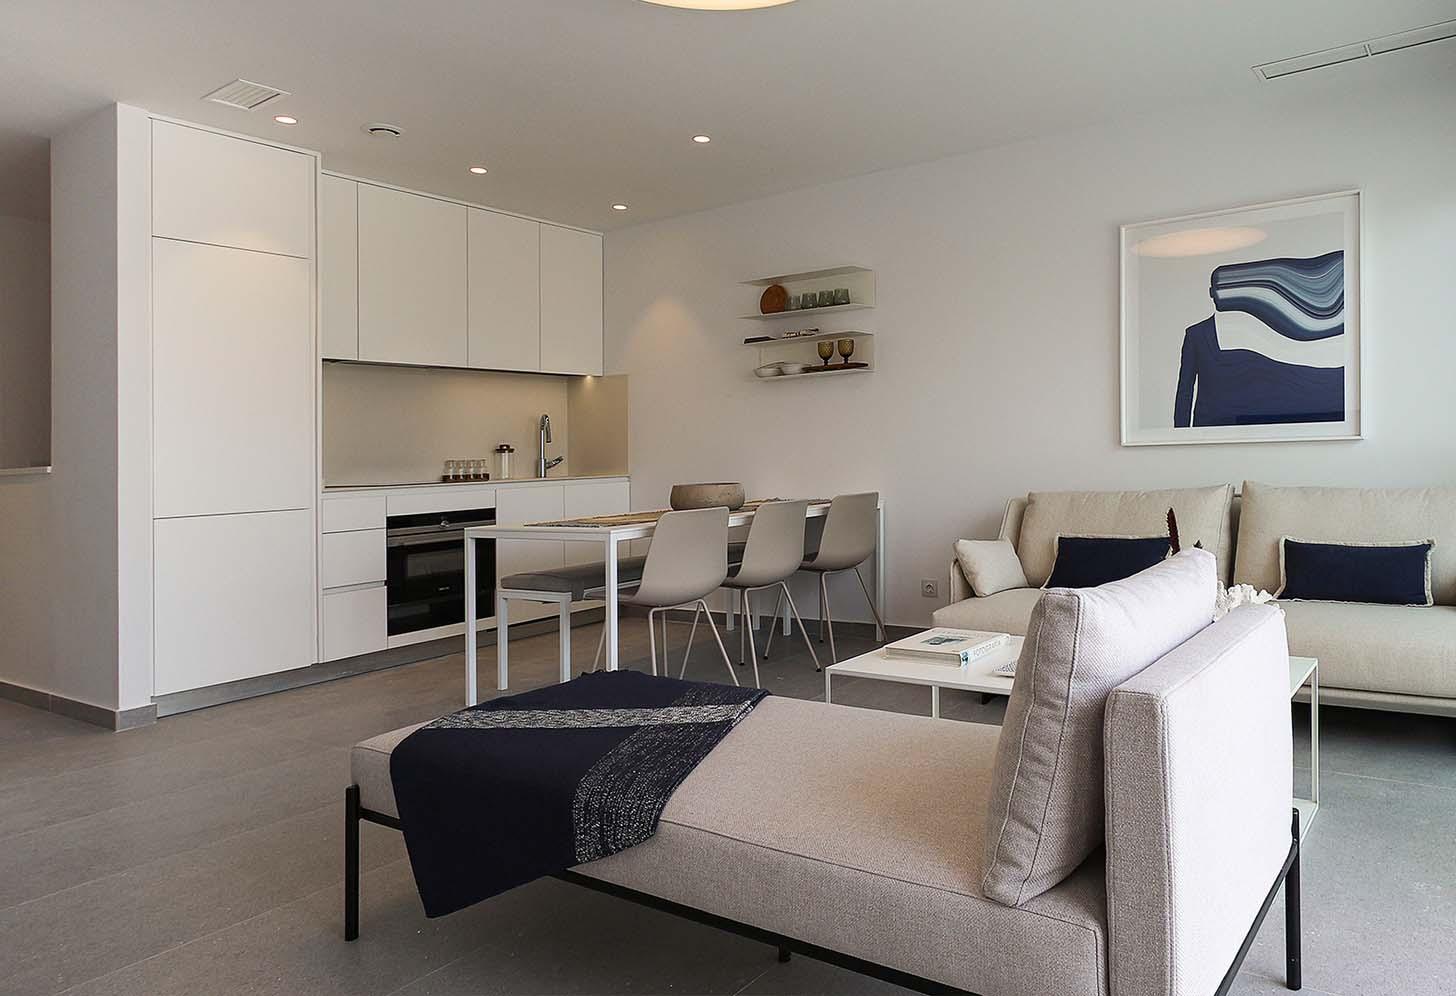 immobilier neuf espagne costa blanca on-3b essence duplex cuisine